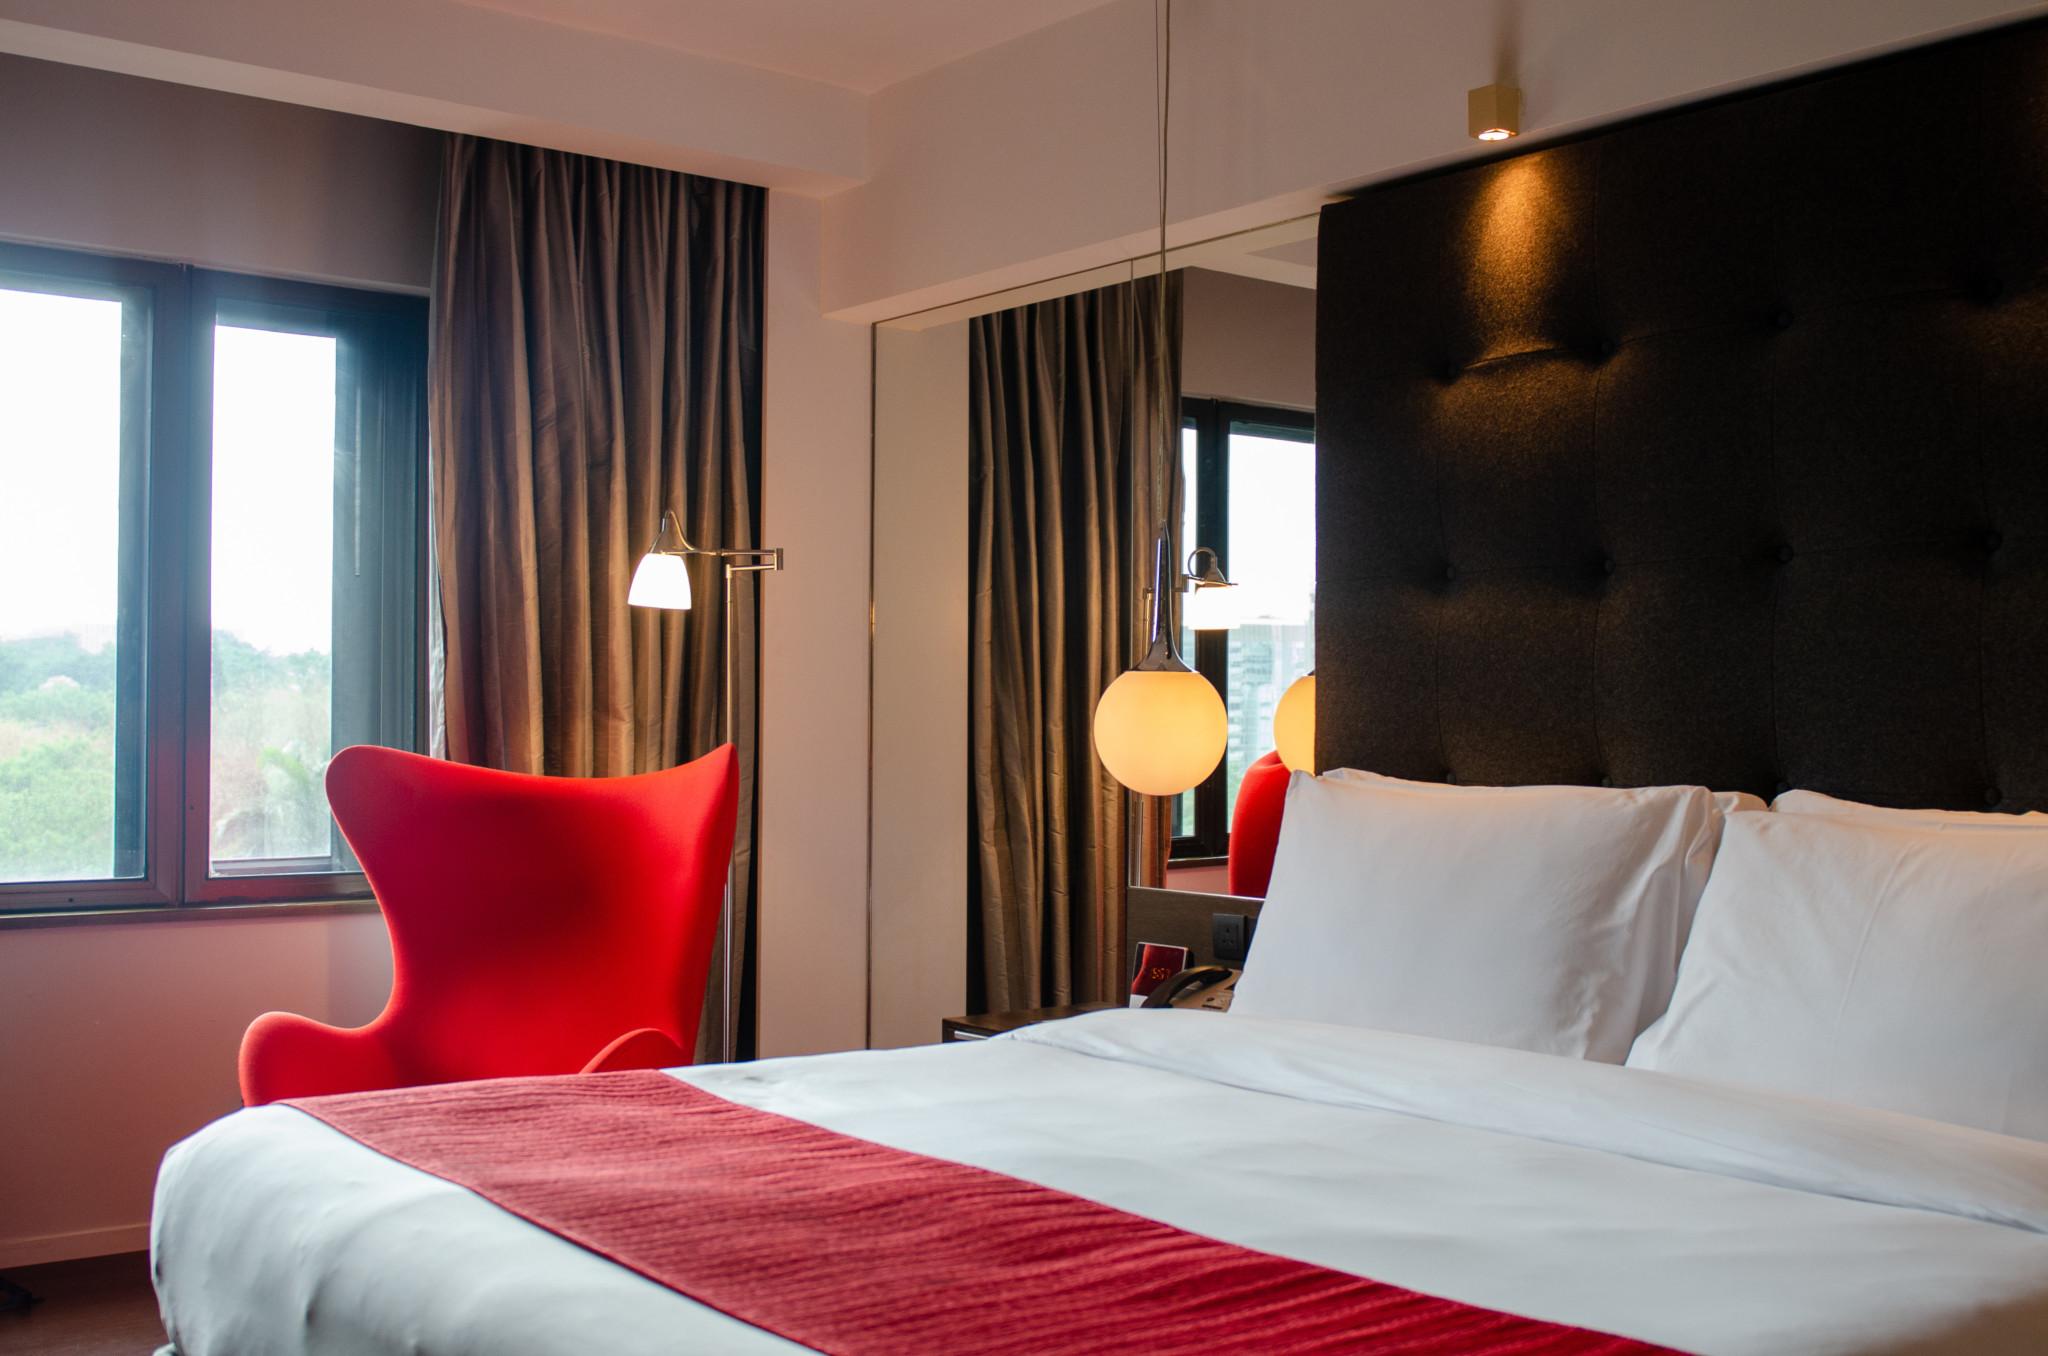 Zu den Hoteltipps für Hongkong gehört auch das Hotel Mira